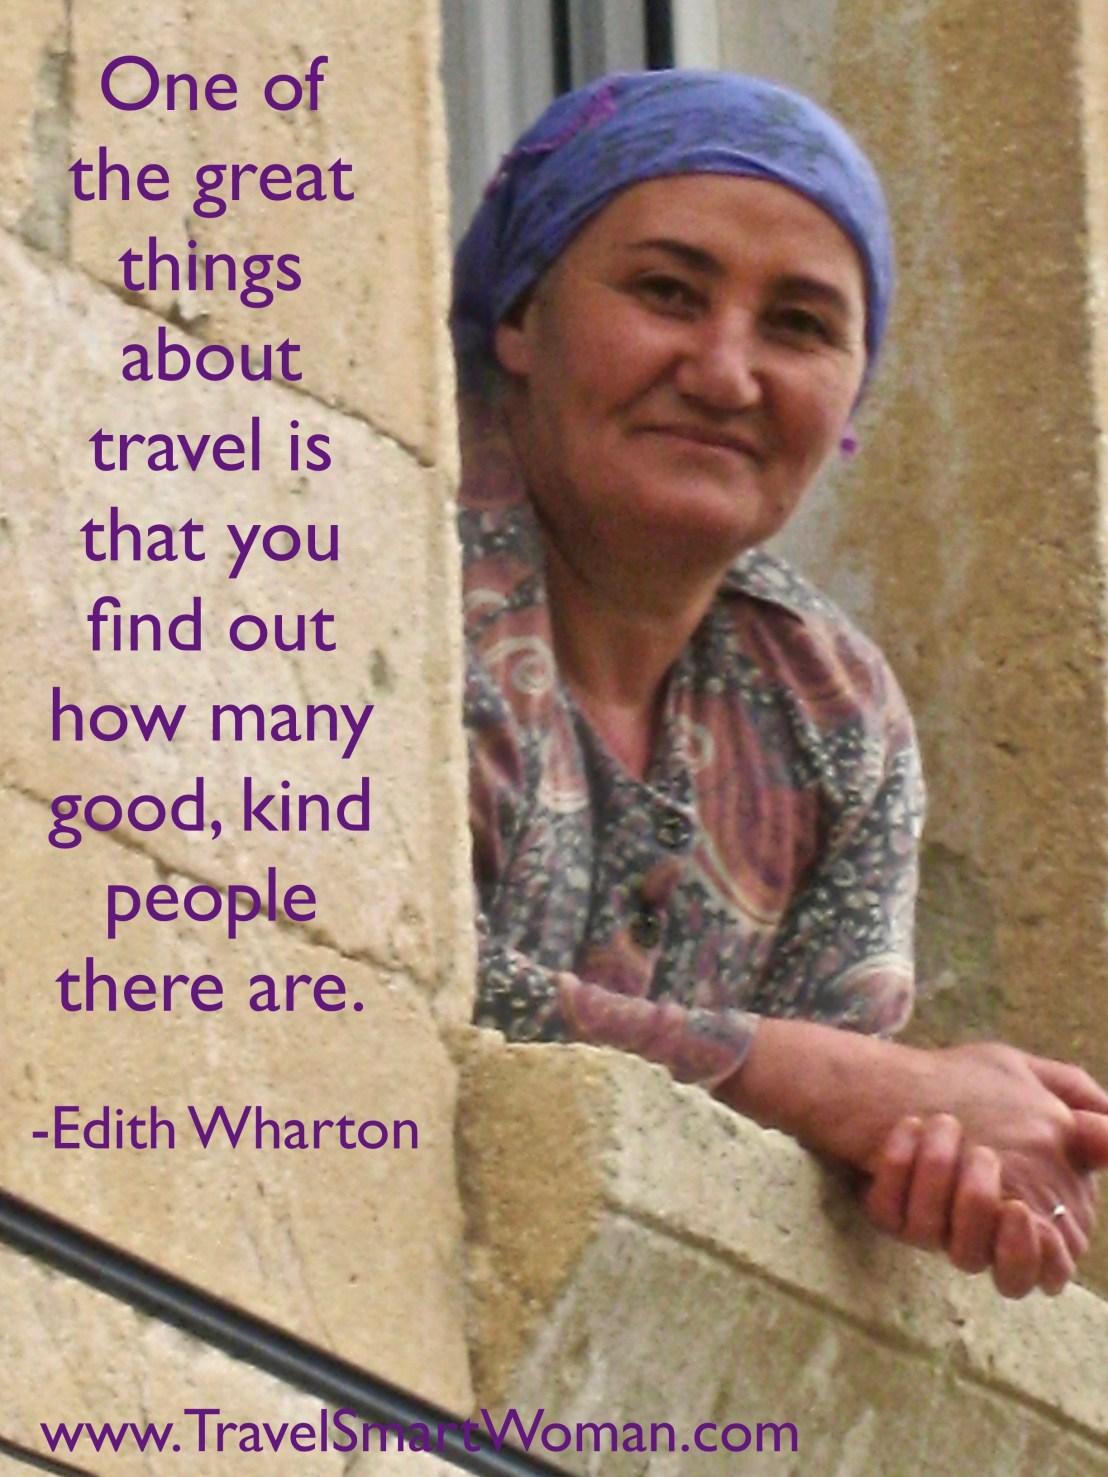 Quote-Edith Wharton